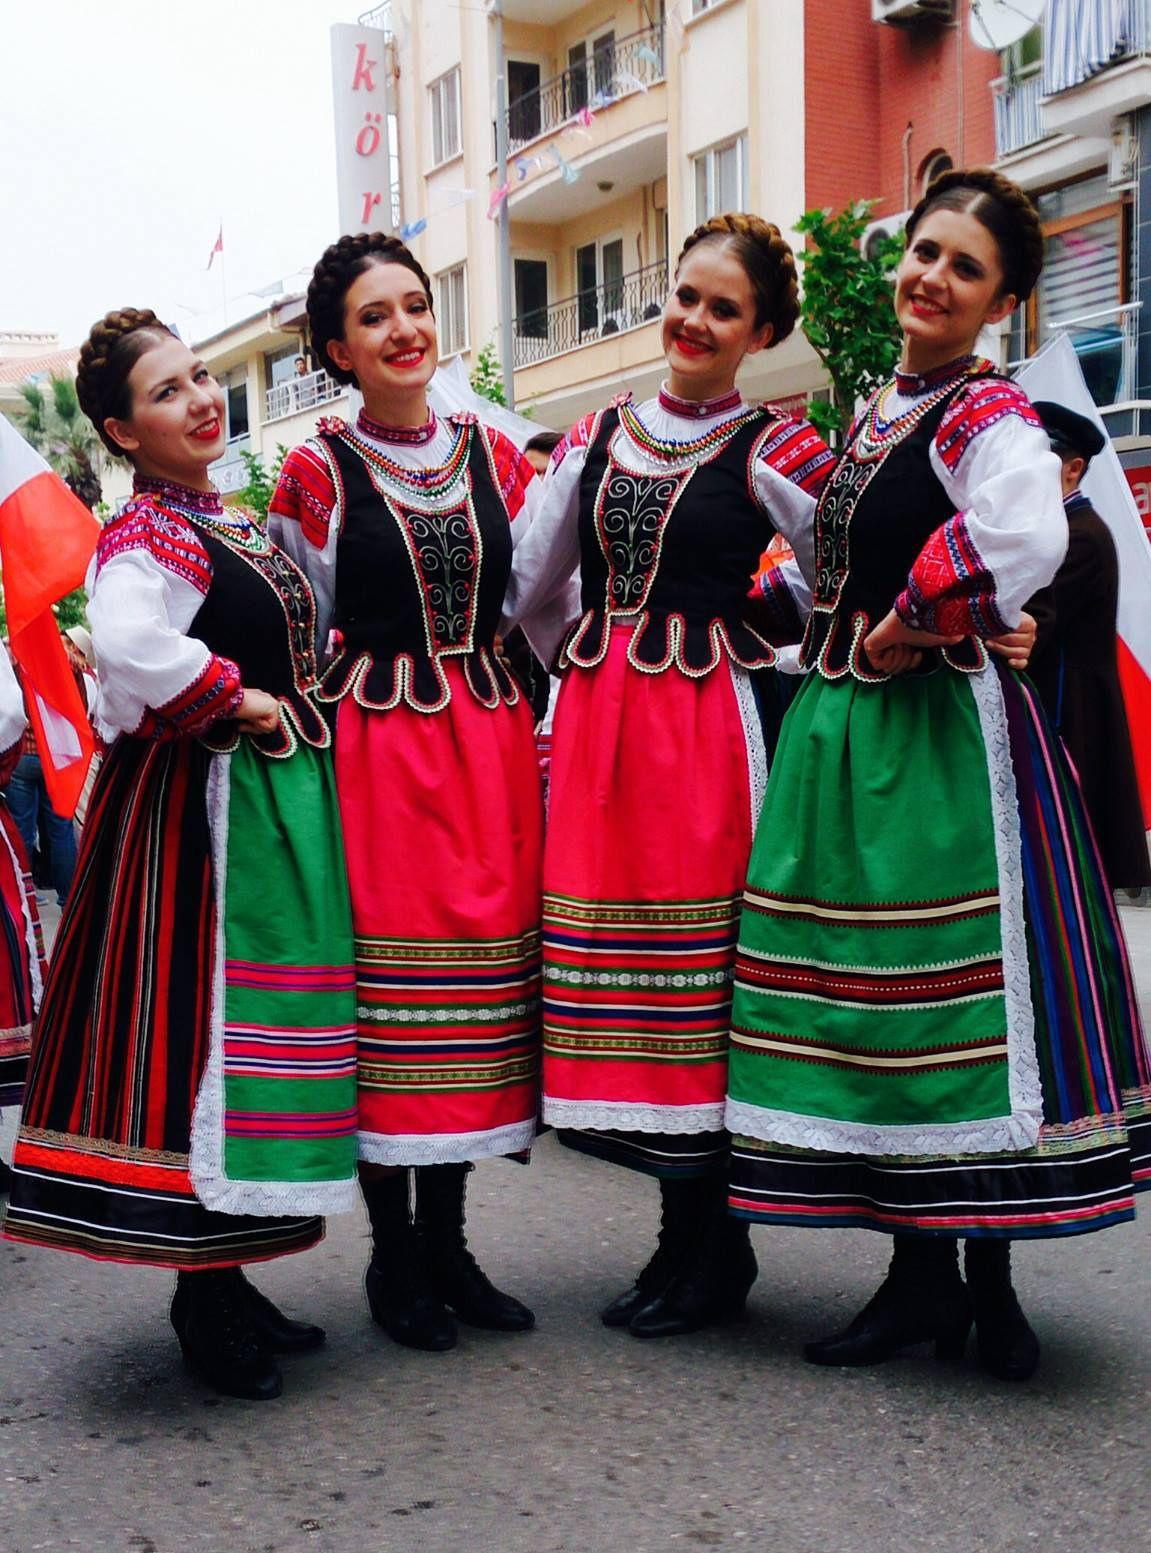 98d9b3b9477b67 Polish Folk Costumes / Polskie stroje ludowe : Photo   Poland in ...